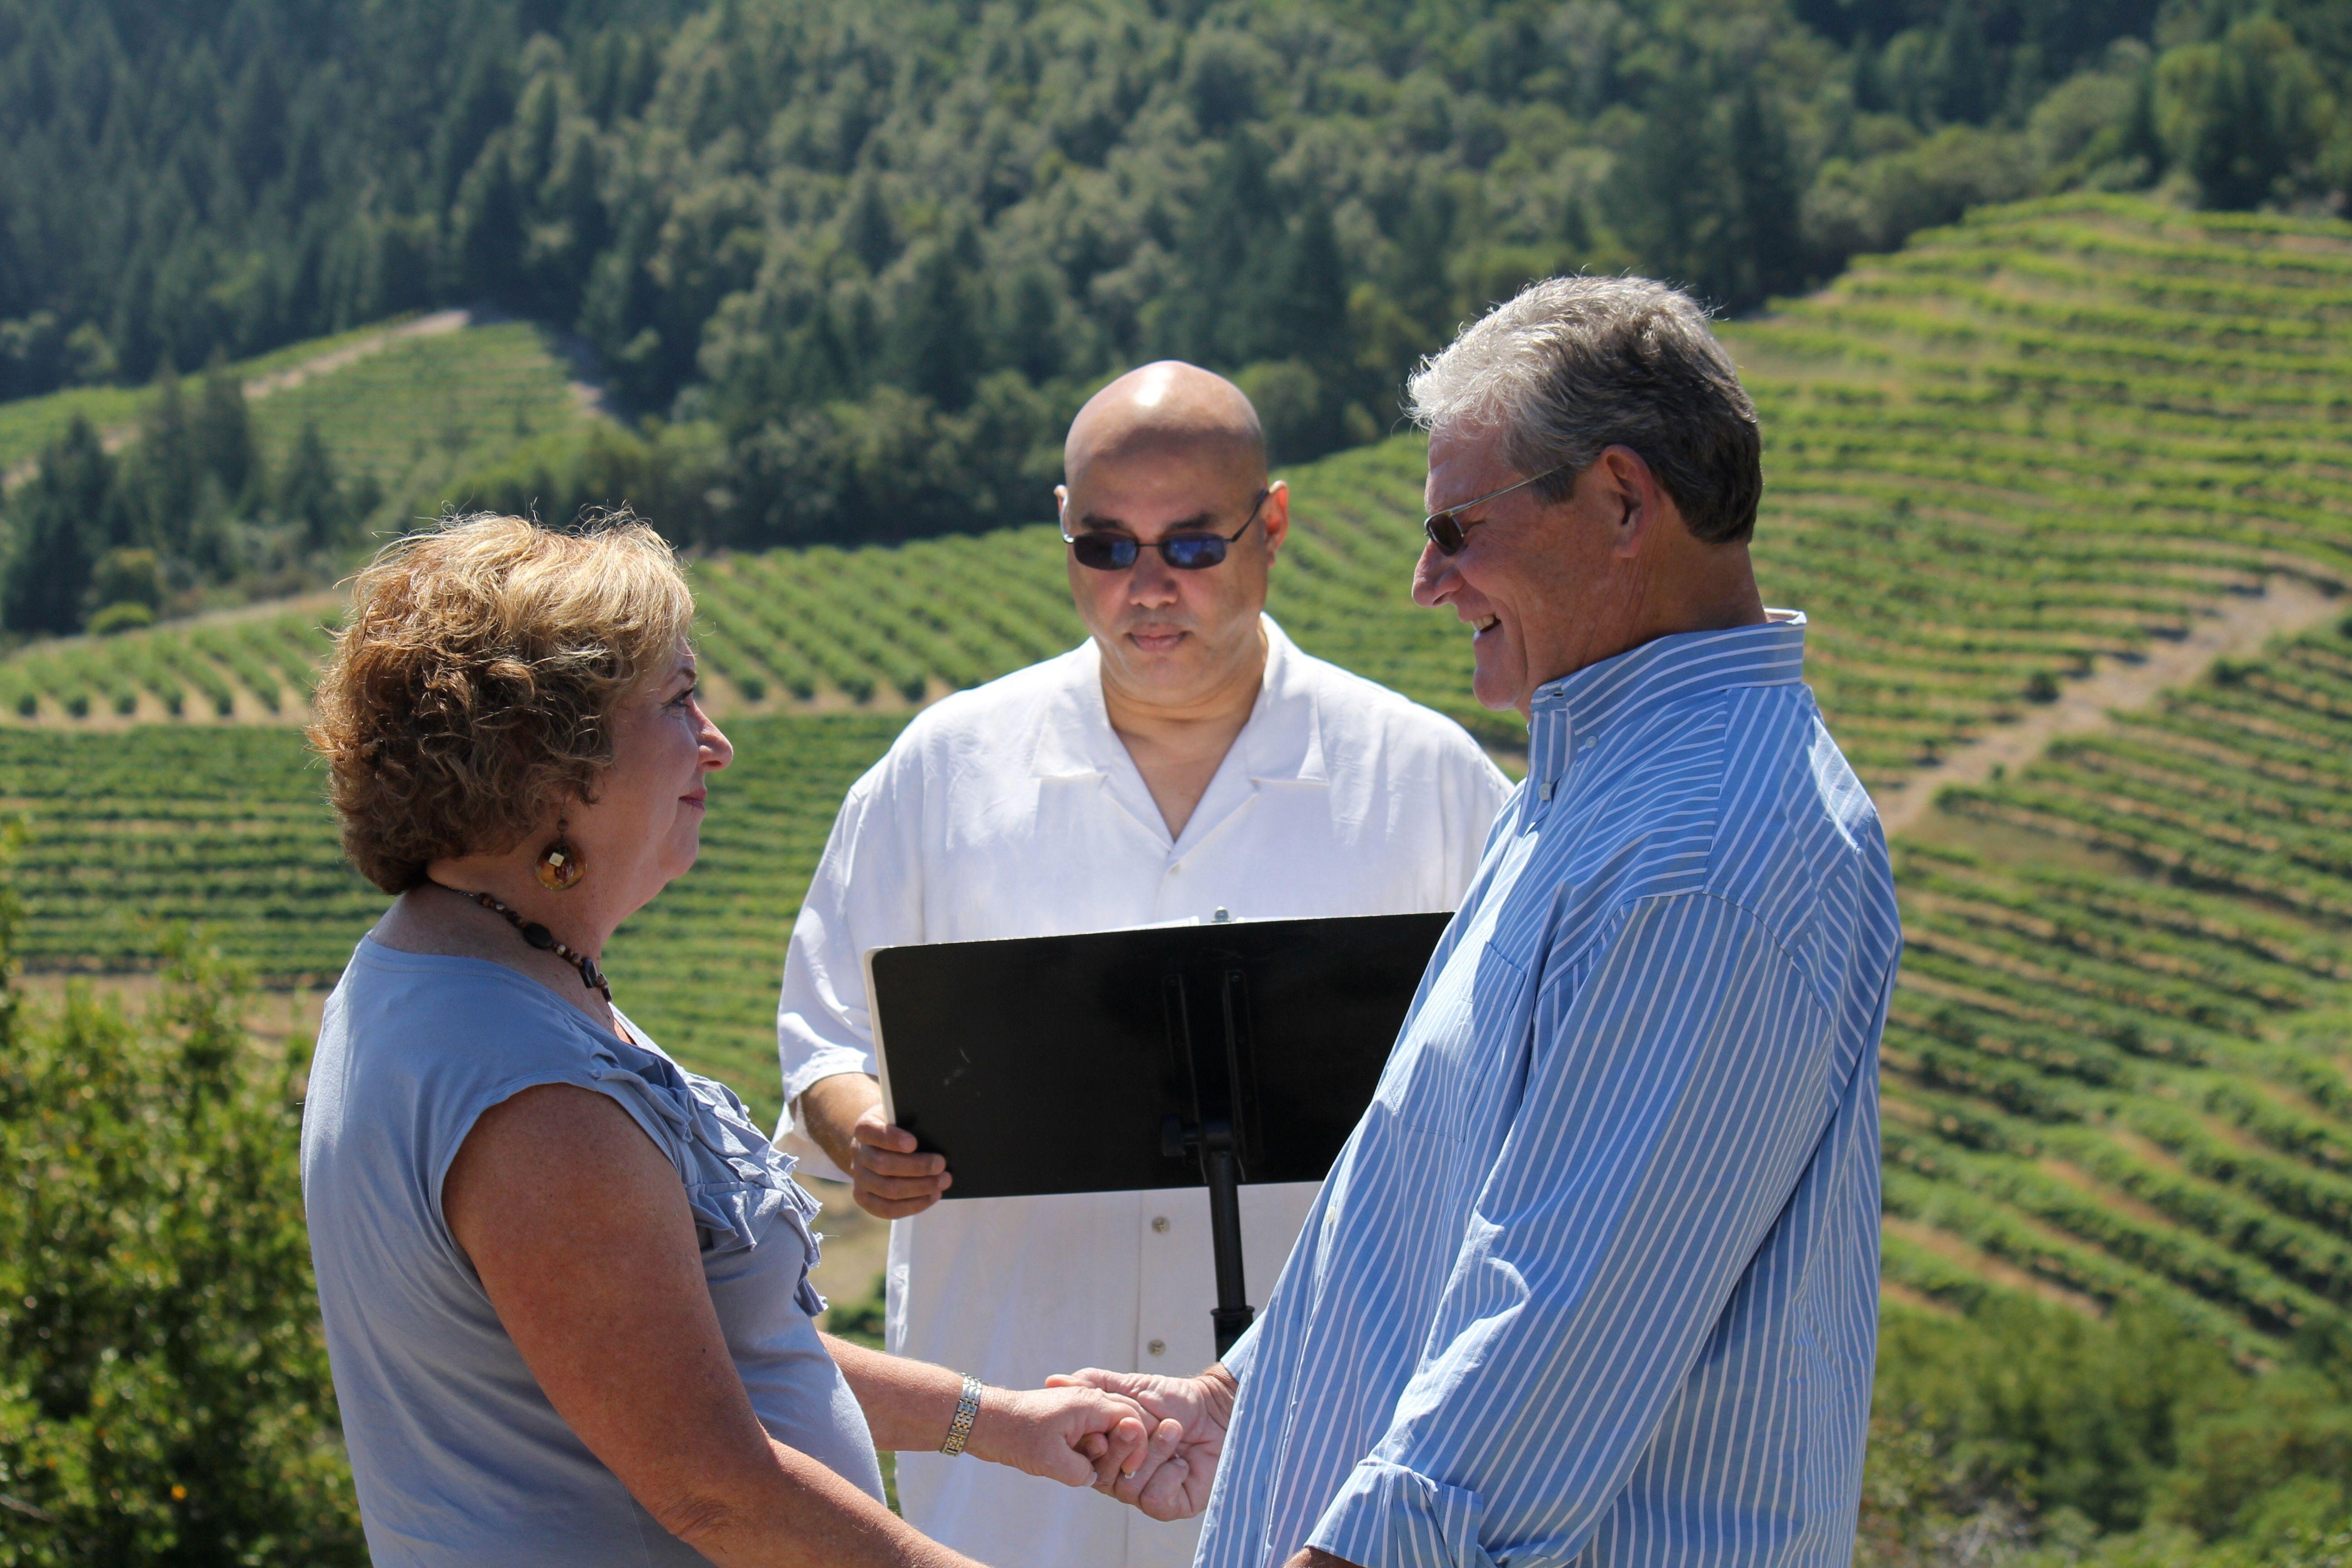 Tom Burgos Vow renewal ceremony, Vows, Christian wedding